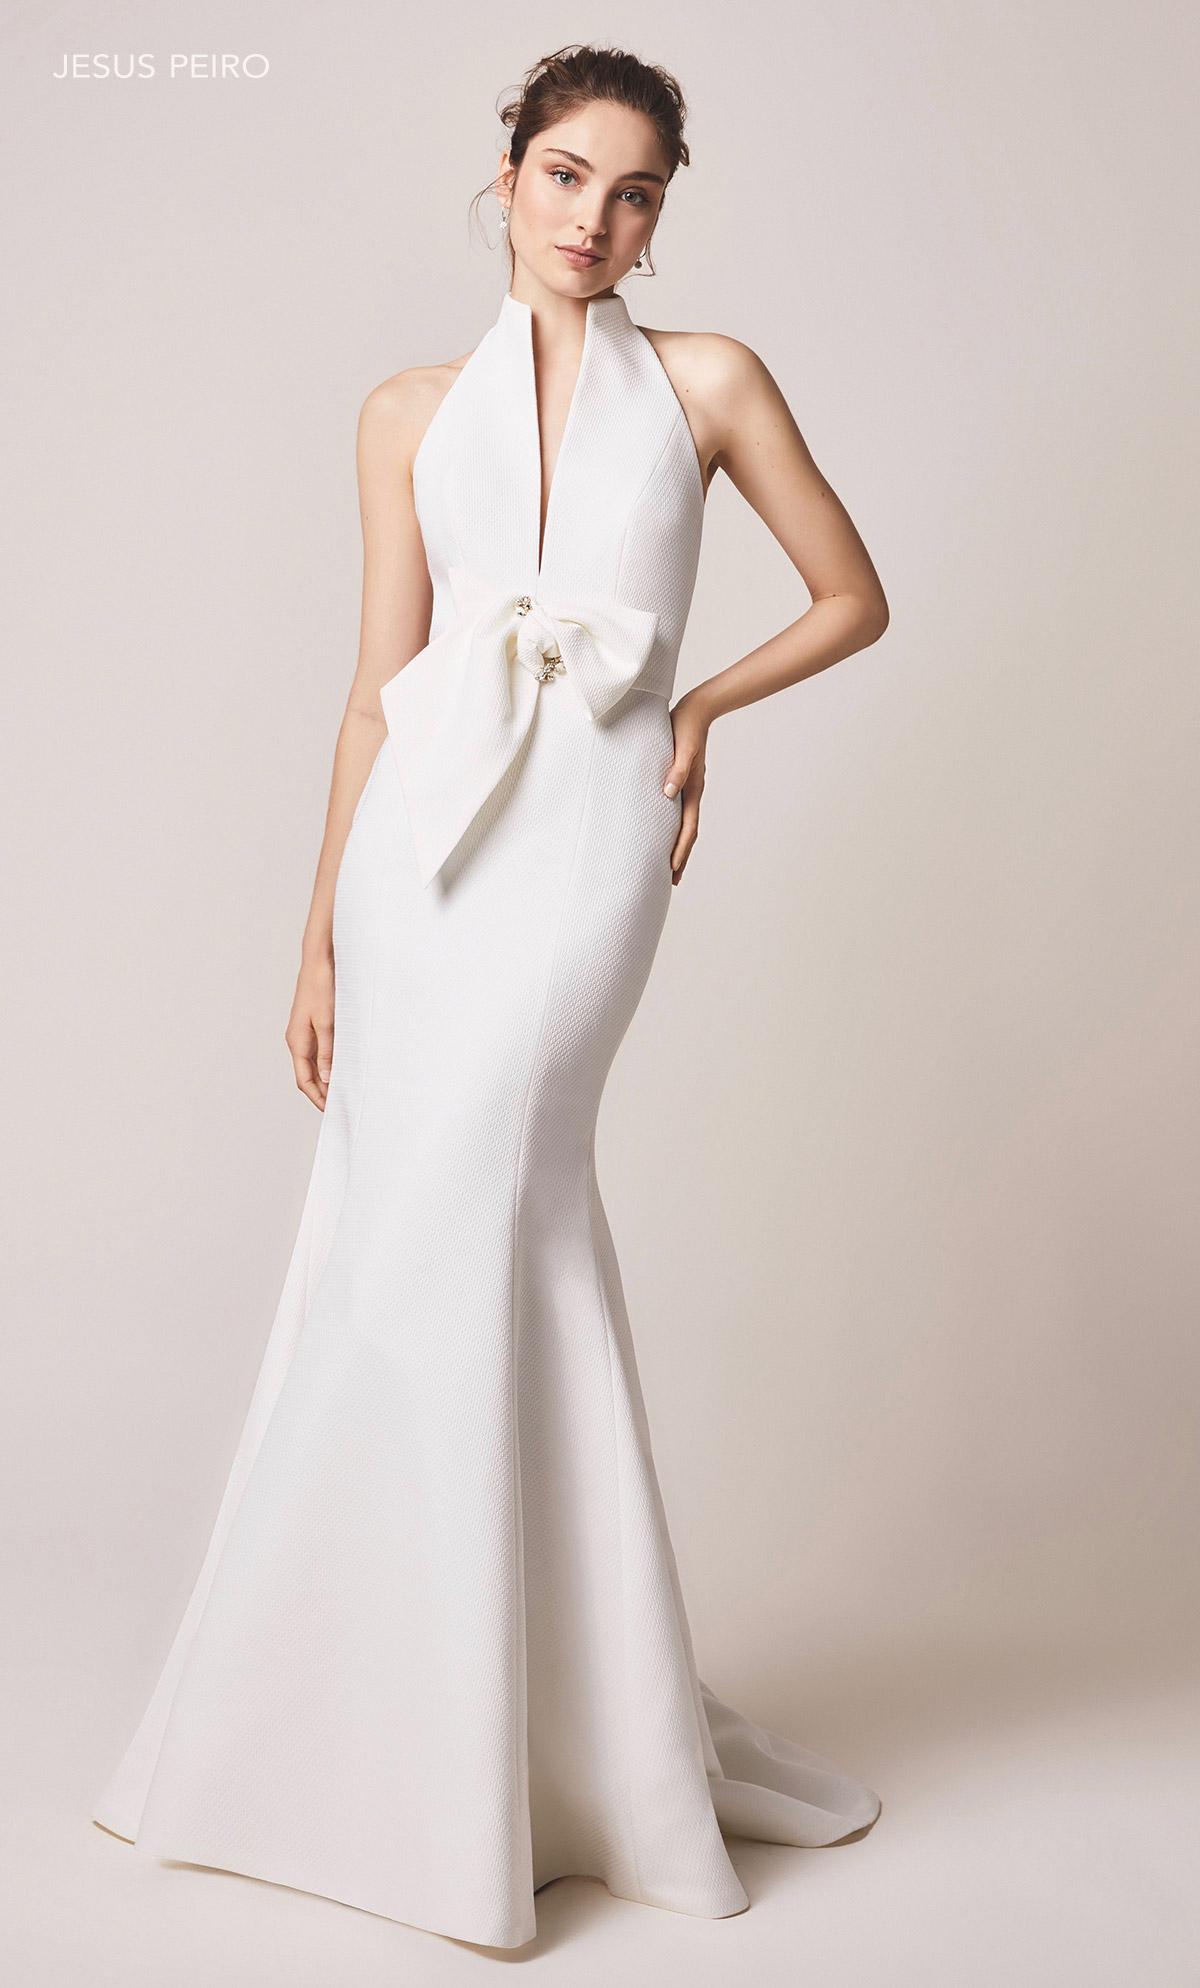 Vestido novia Jesús Peiró Ref.112